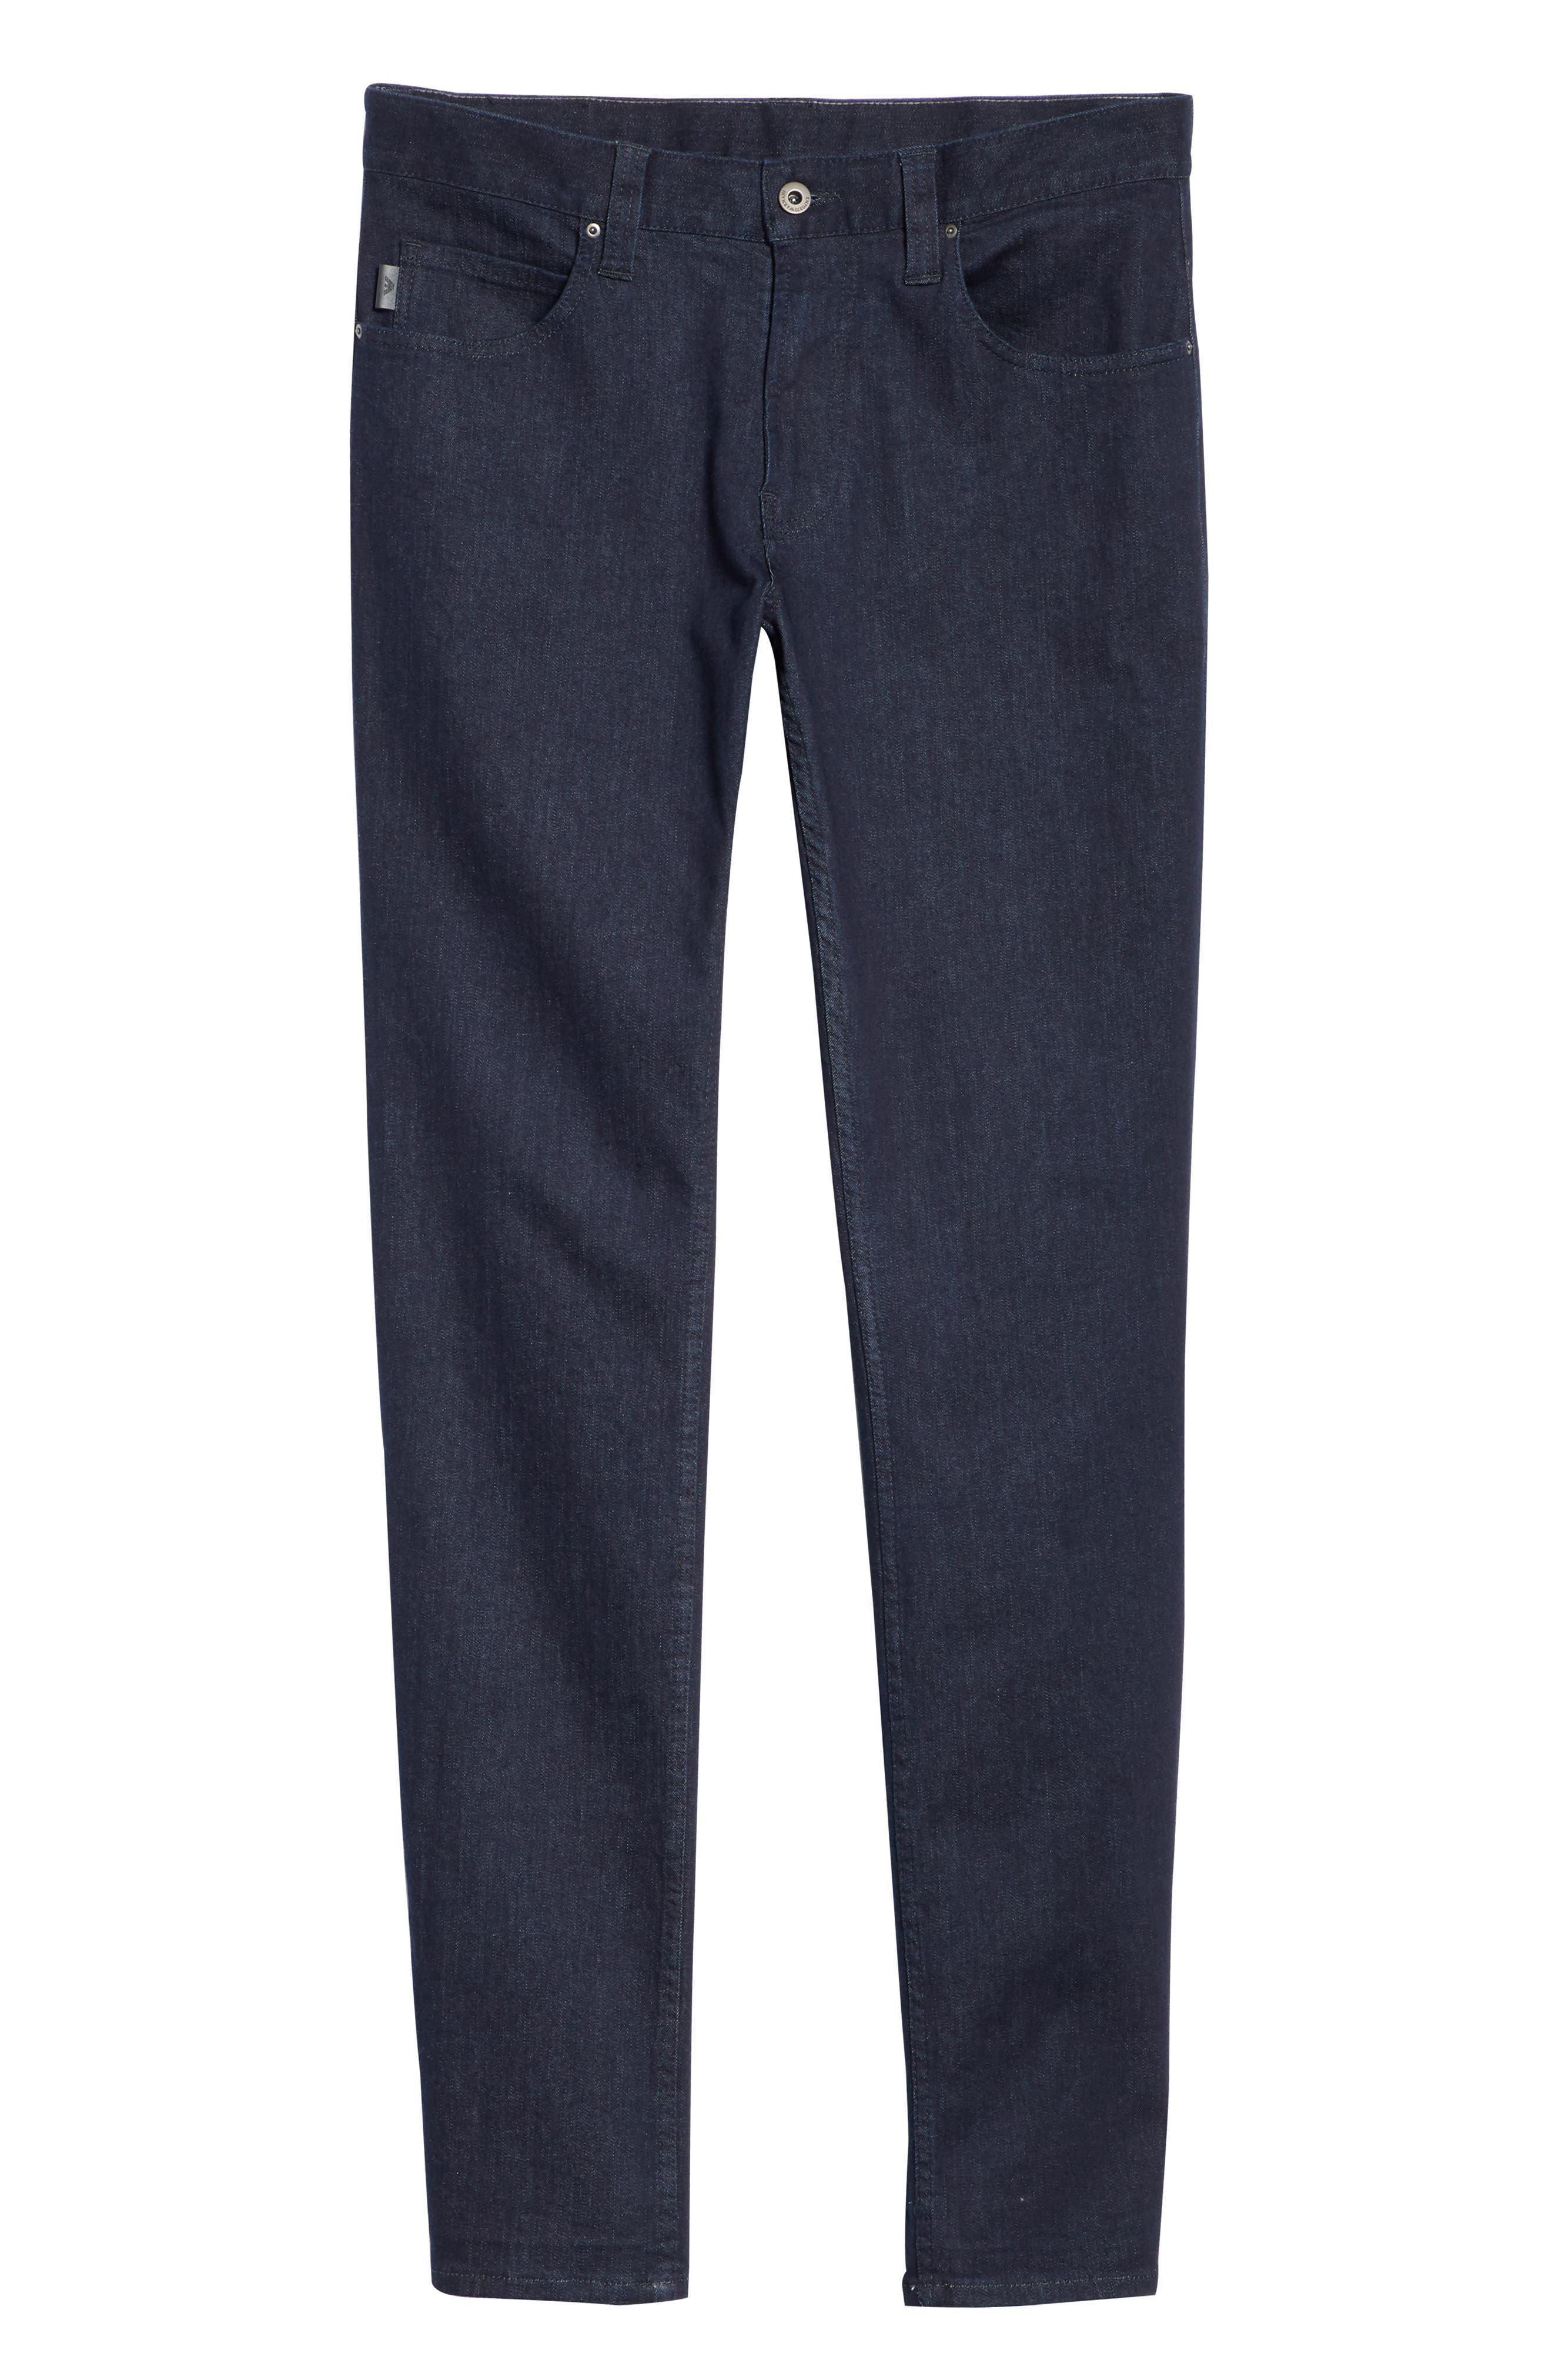 Straight Leg Stretch Jeans,                             Alternate thumbnail 6, color,                             DARK BLUE